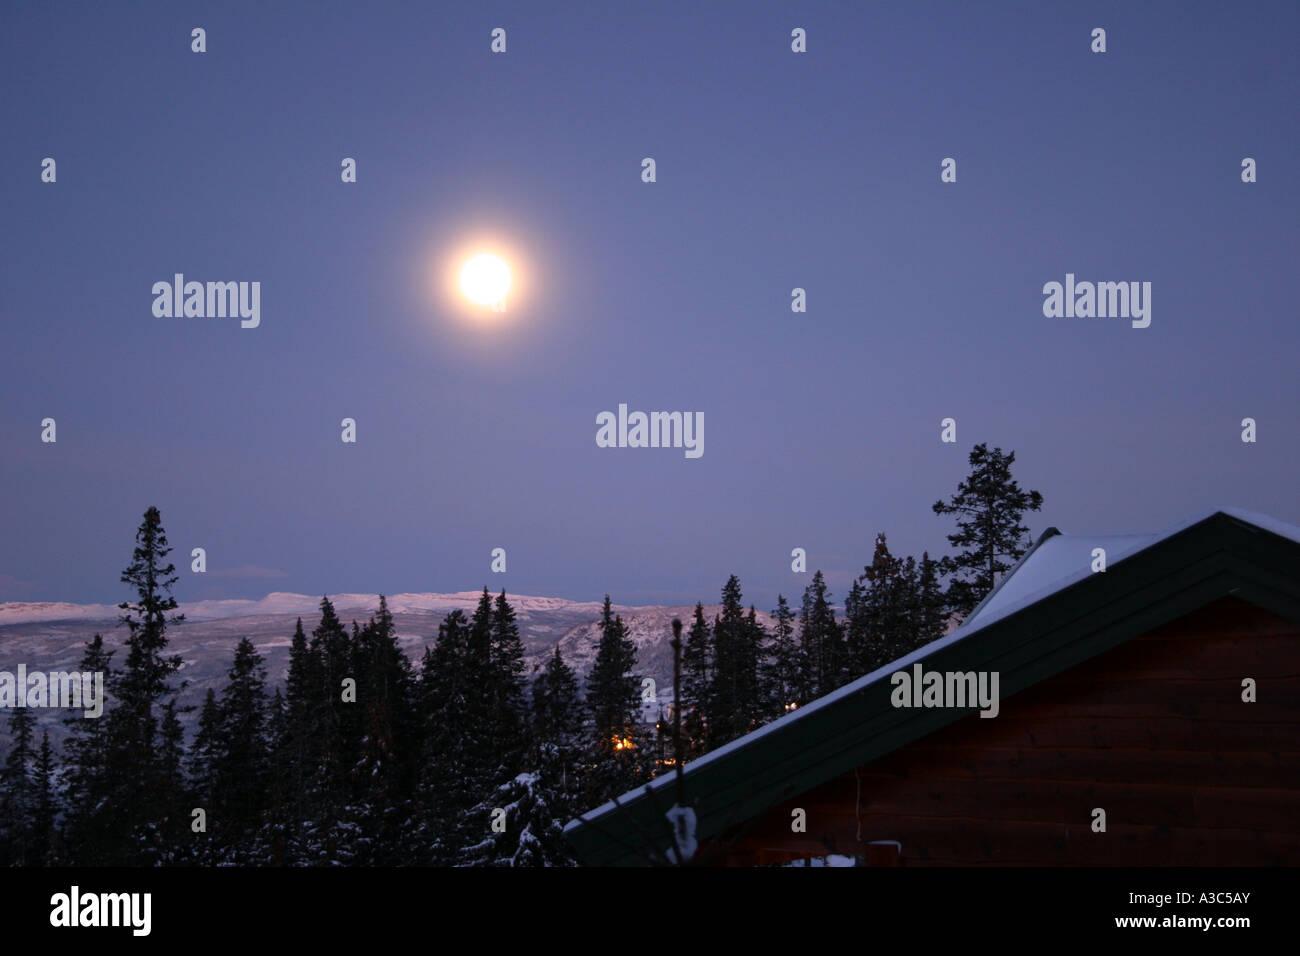 Moonshine in Lillehammer - Stock Image